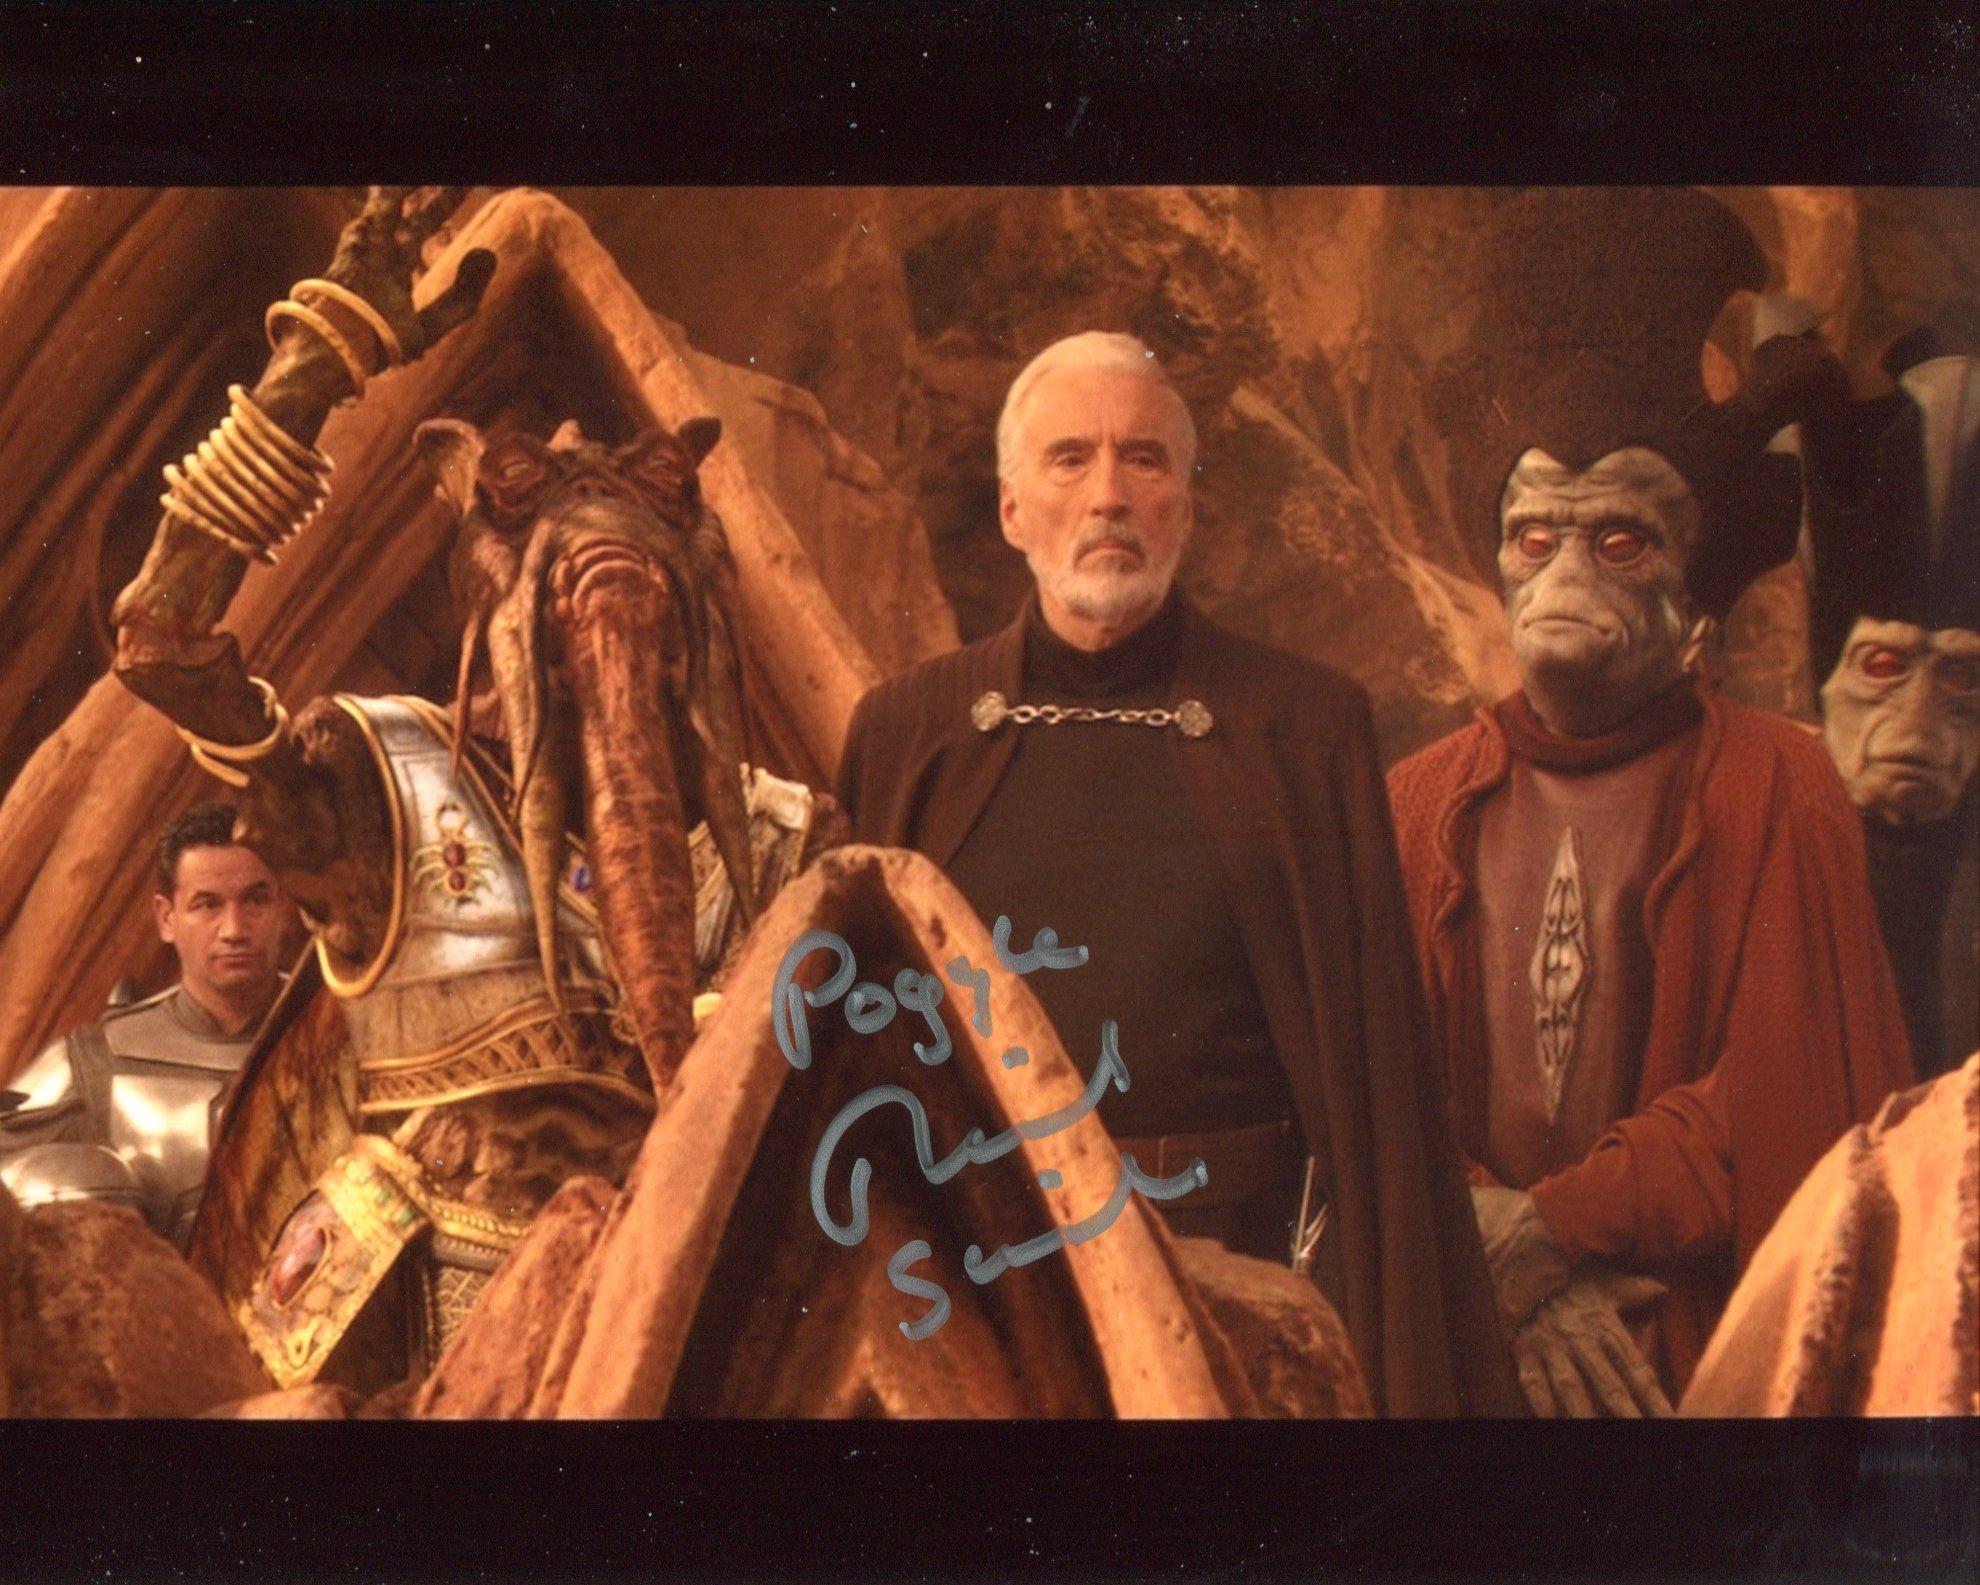 Star Wars. Nice 8x10 scene photo signed by Star Wars actor Richard Stride (Poggle). Good